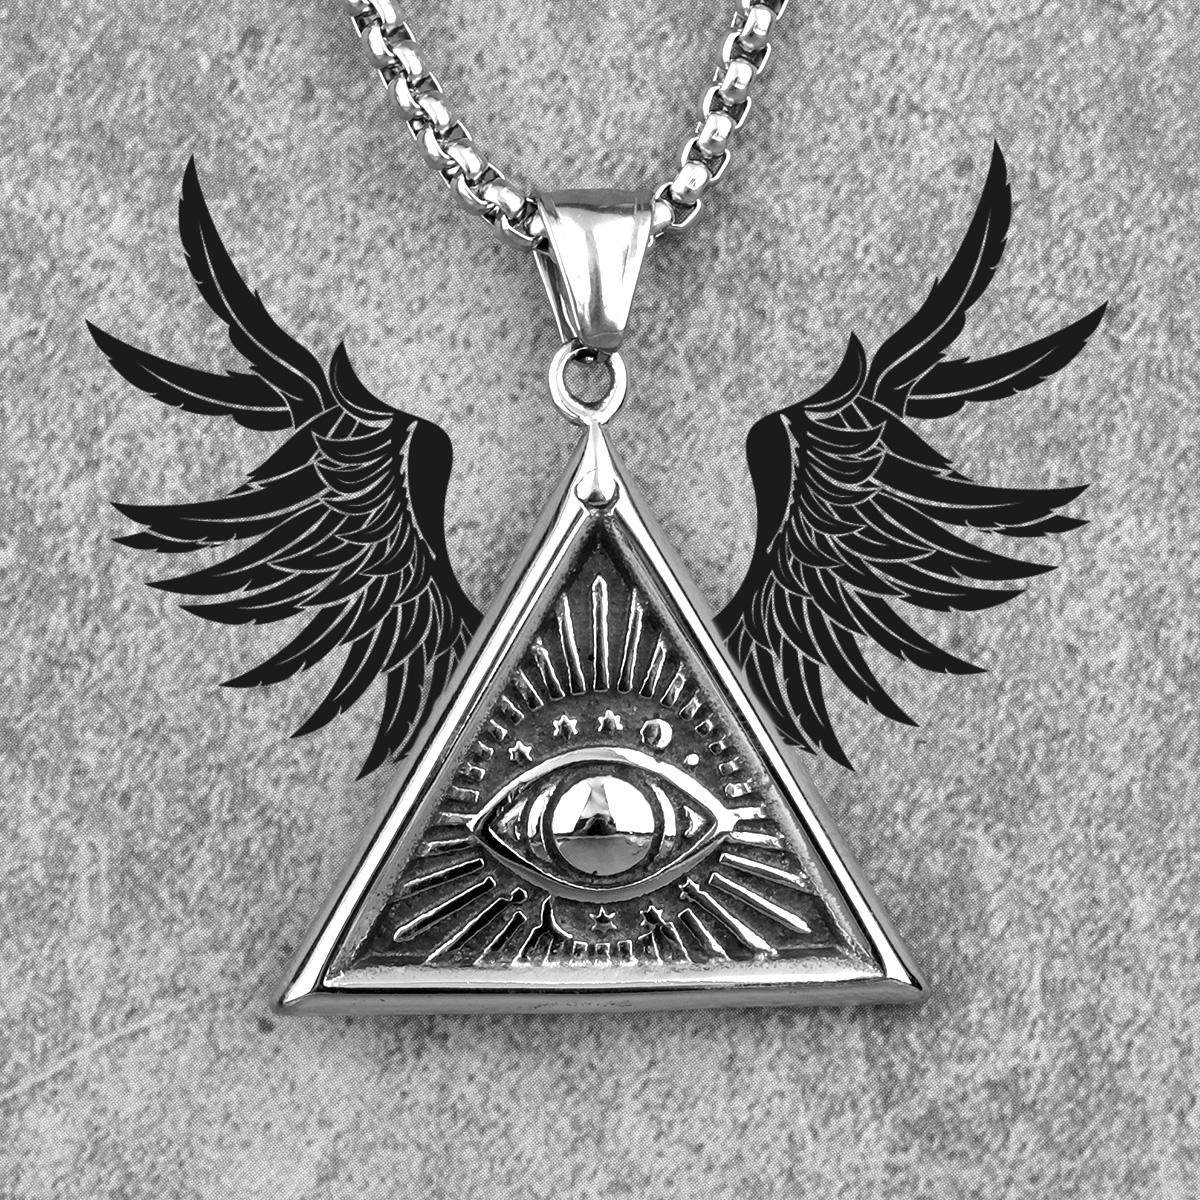 Men/'s Stainless Steel Necklace Men/'s Necklace Boyfriend Gift Men/'s Jewelry Husband Gift Men/'s Pendant Men/'s Triangle Necklace